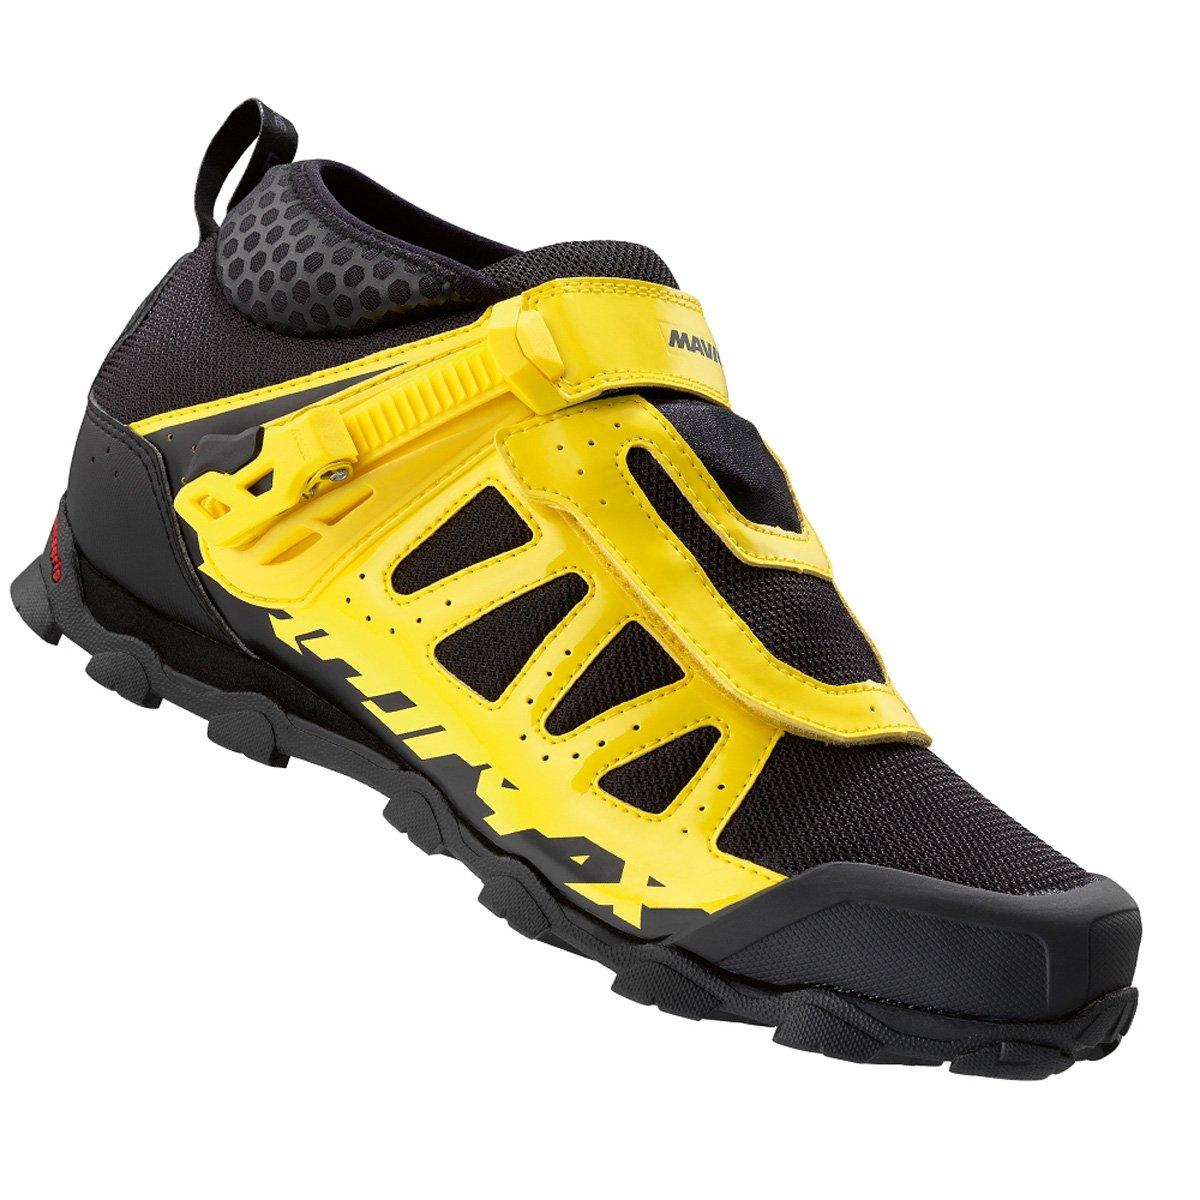 Mavic Crossmax XL Pro Zapatos L3779490010